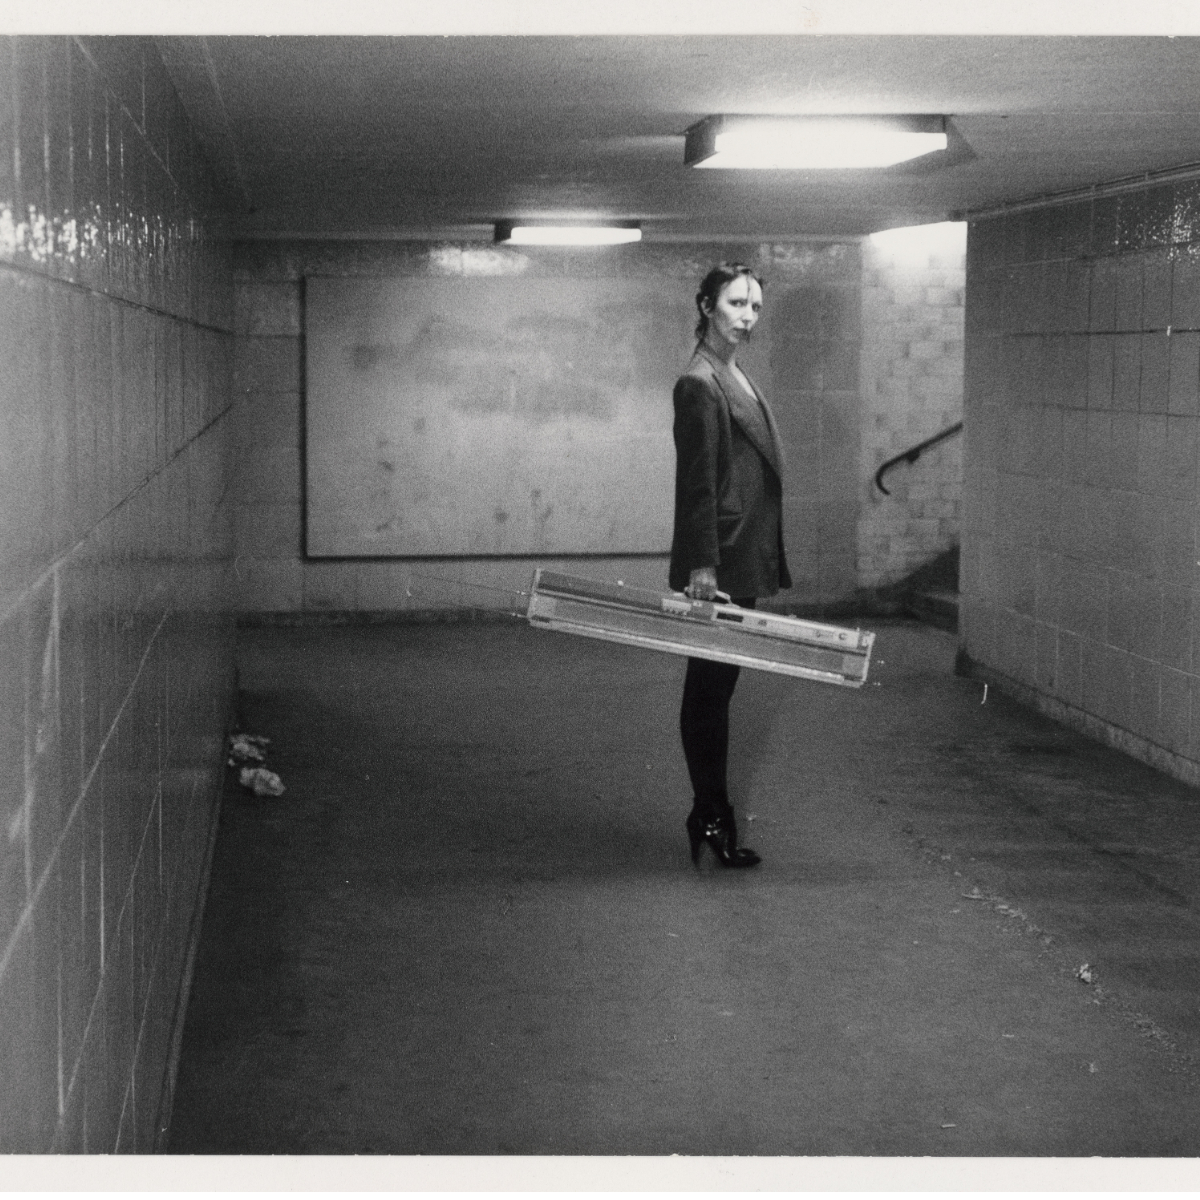 Martin Kippenberger, Ohne Titel  ca. 1976-77,  Estate of Martin Kippenberger, Galerie Gisela Capitain, Cologne